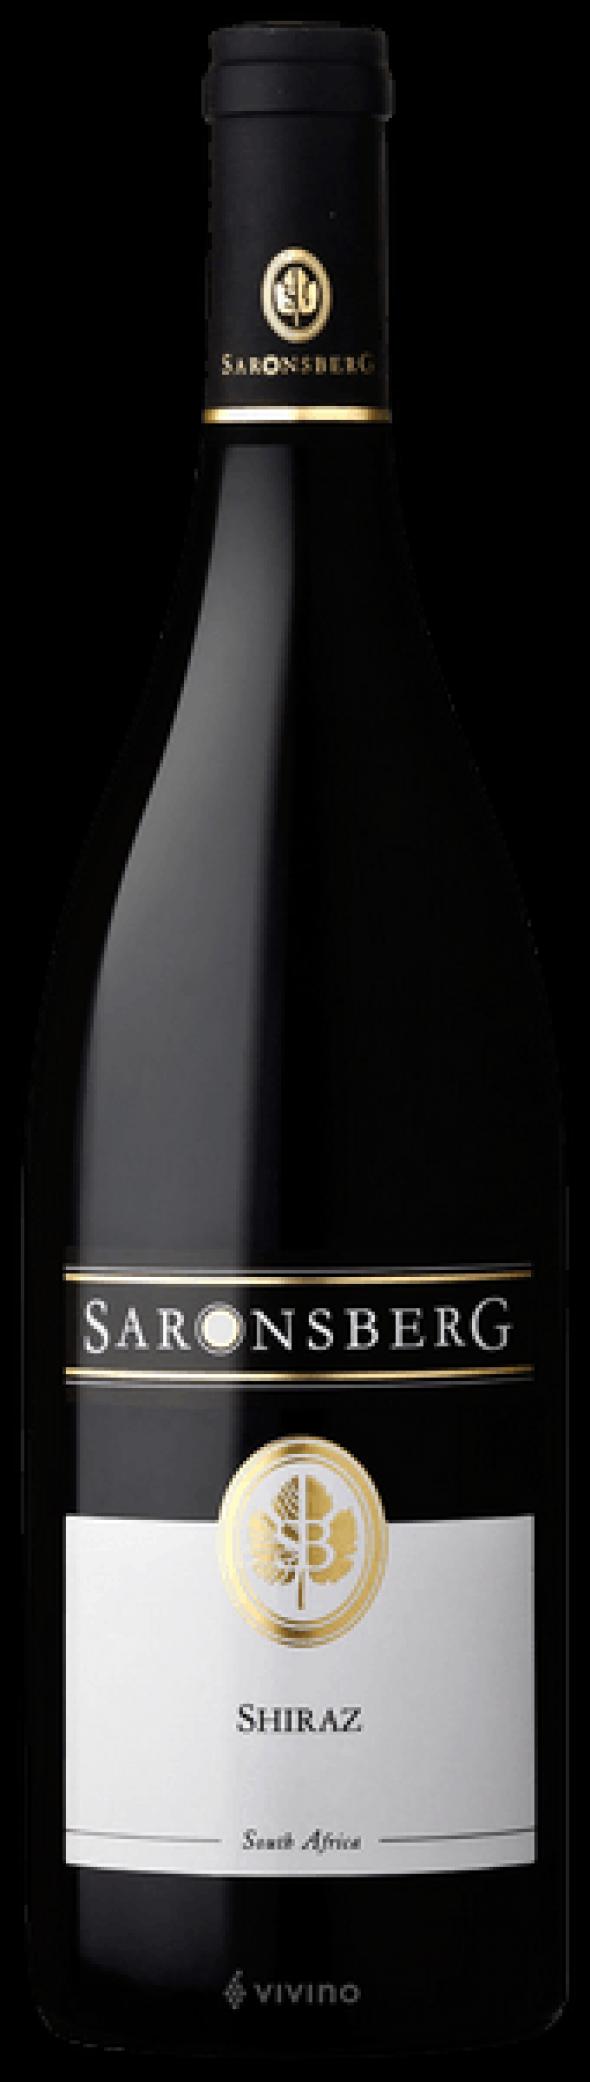 Cape Winemakers Guild (Dewaldt Heyns), Saronsberg Die Erf Shiraz, Swartland